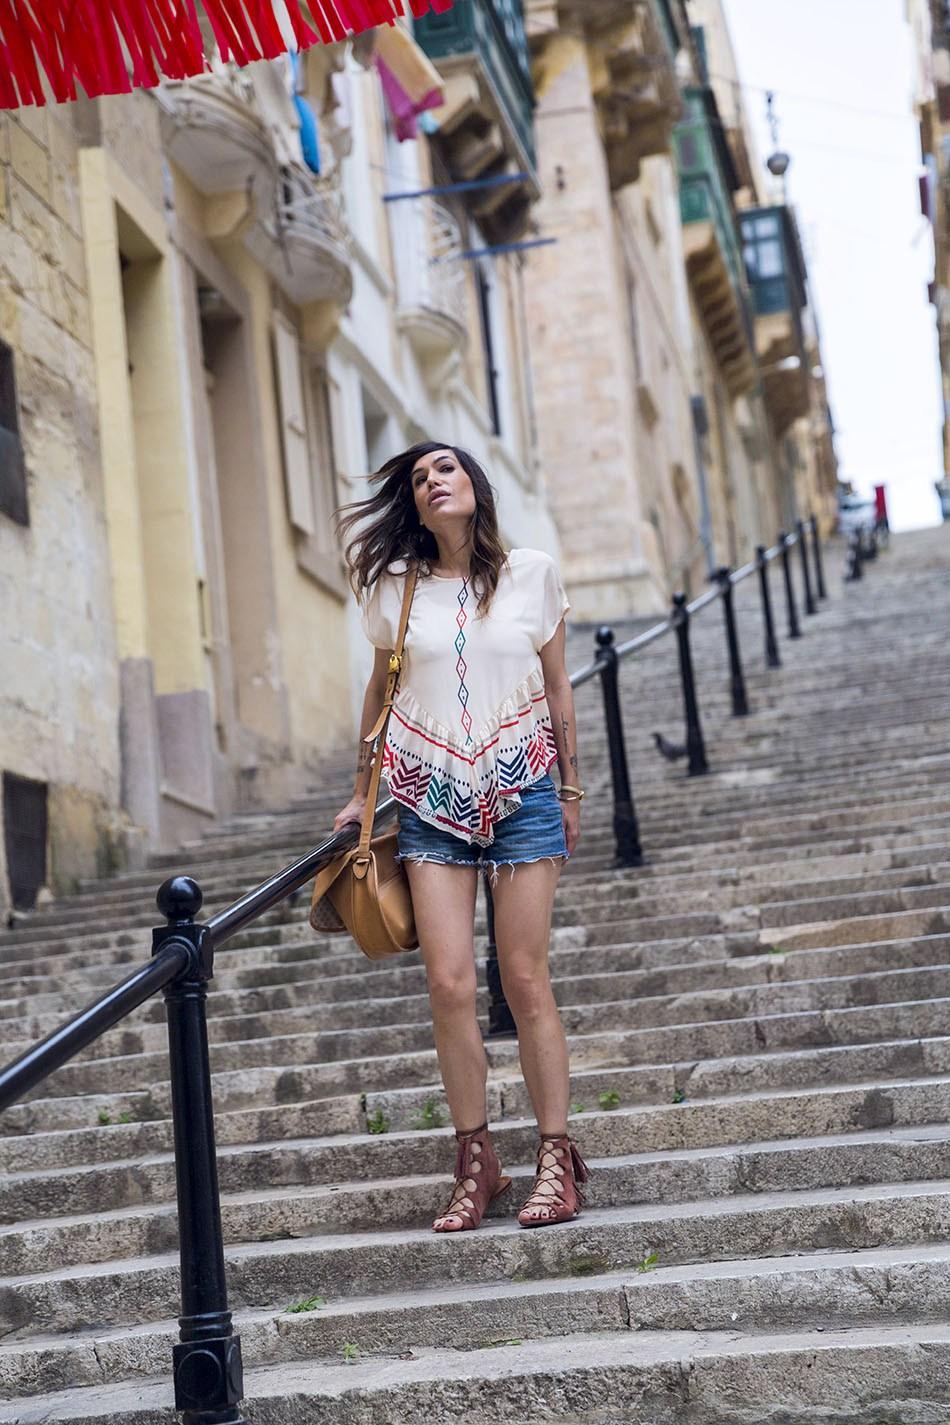 street style june 2016 outfits review bárbara crespo 04